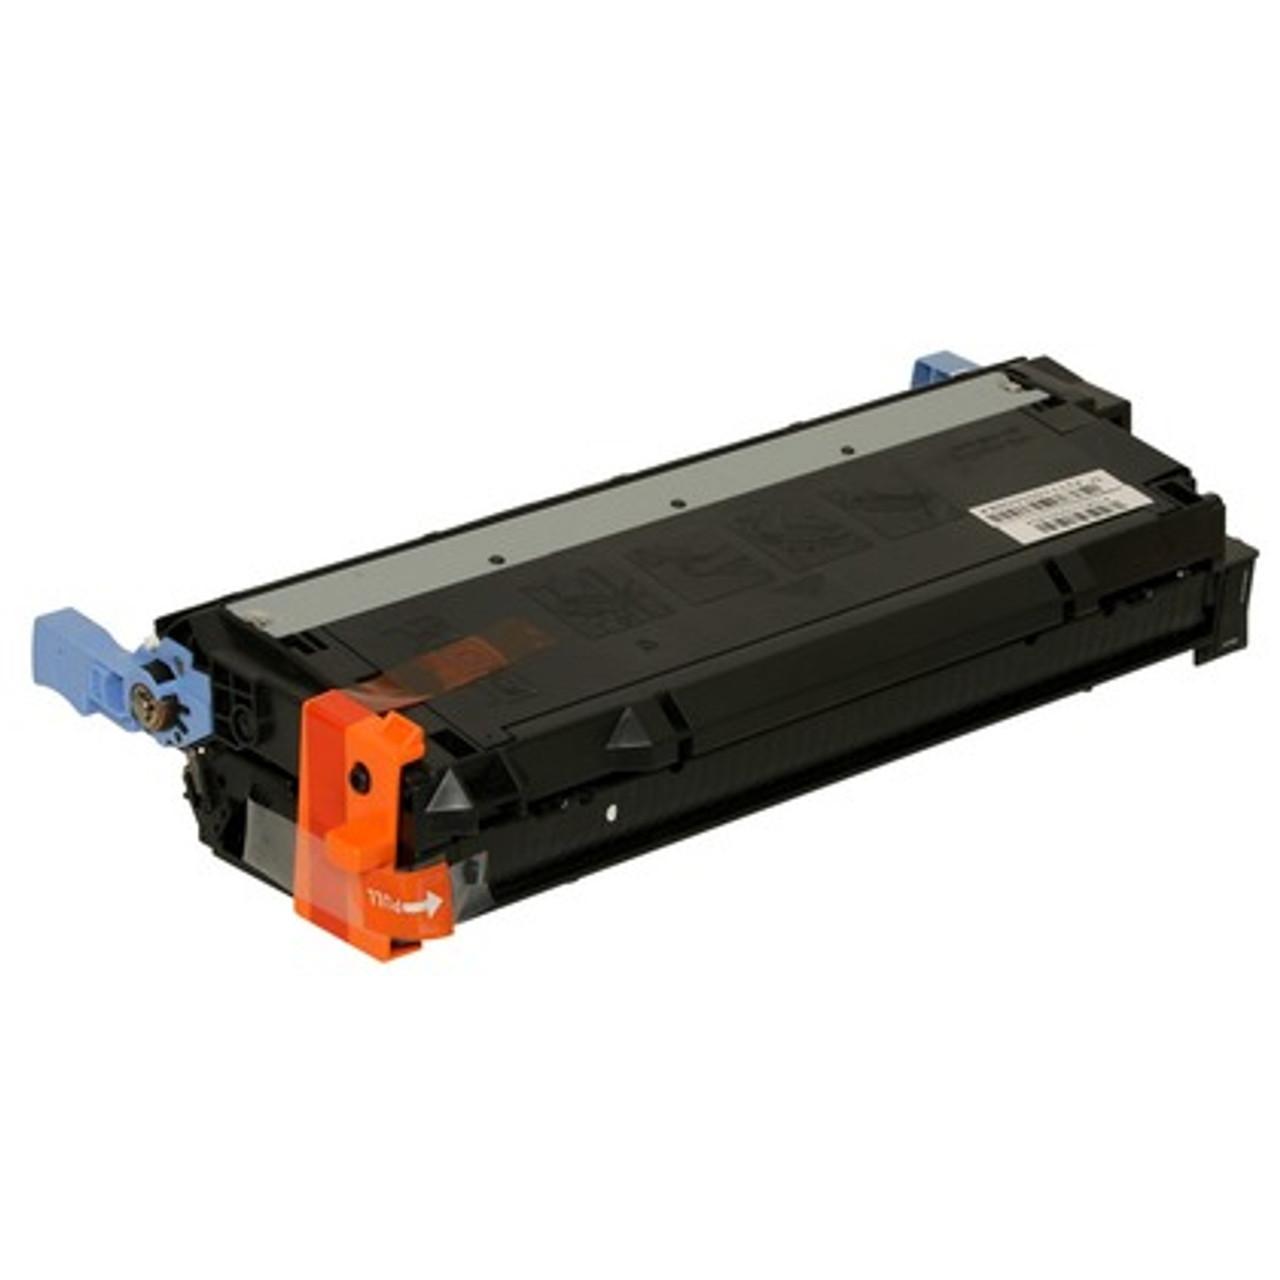 HP 5500 5550 Yellow Toner Cartridge- New Compatible